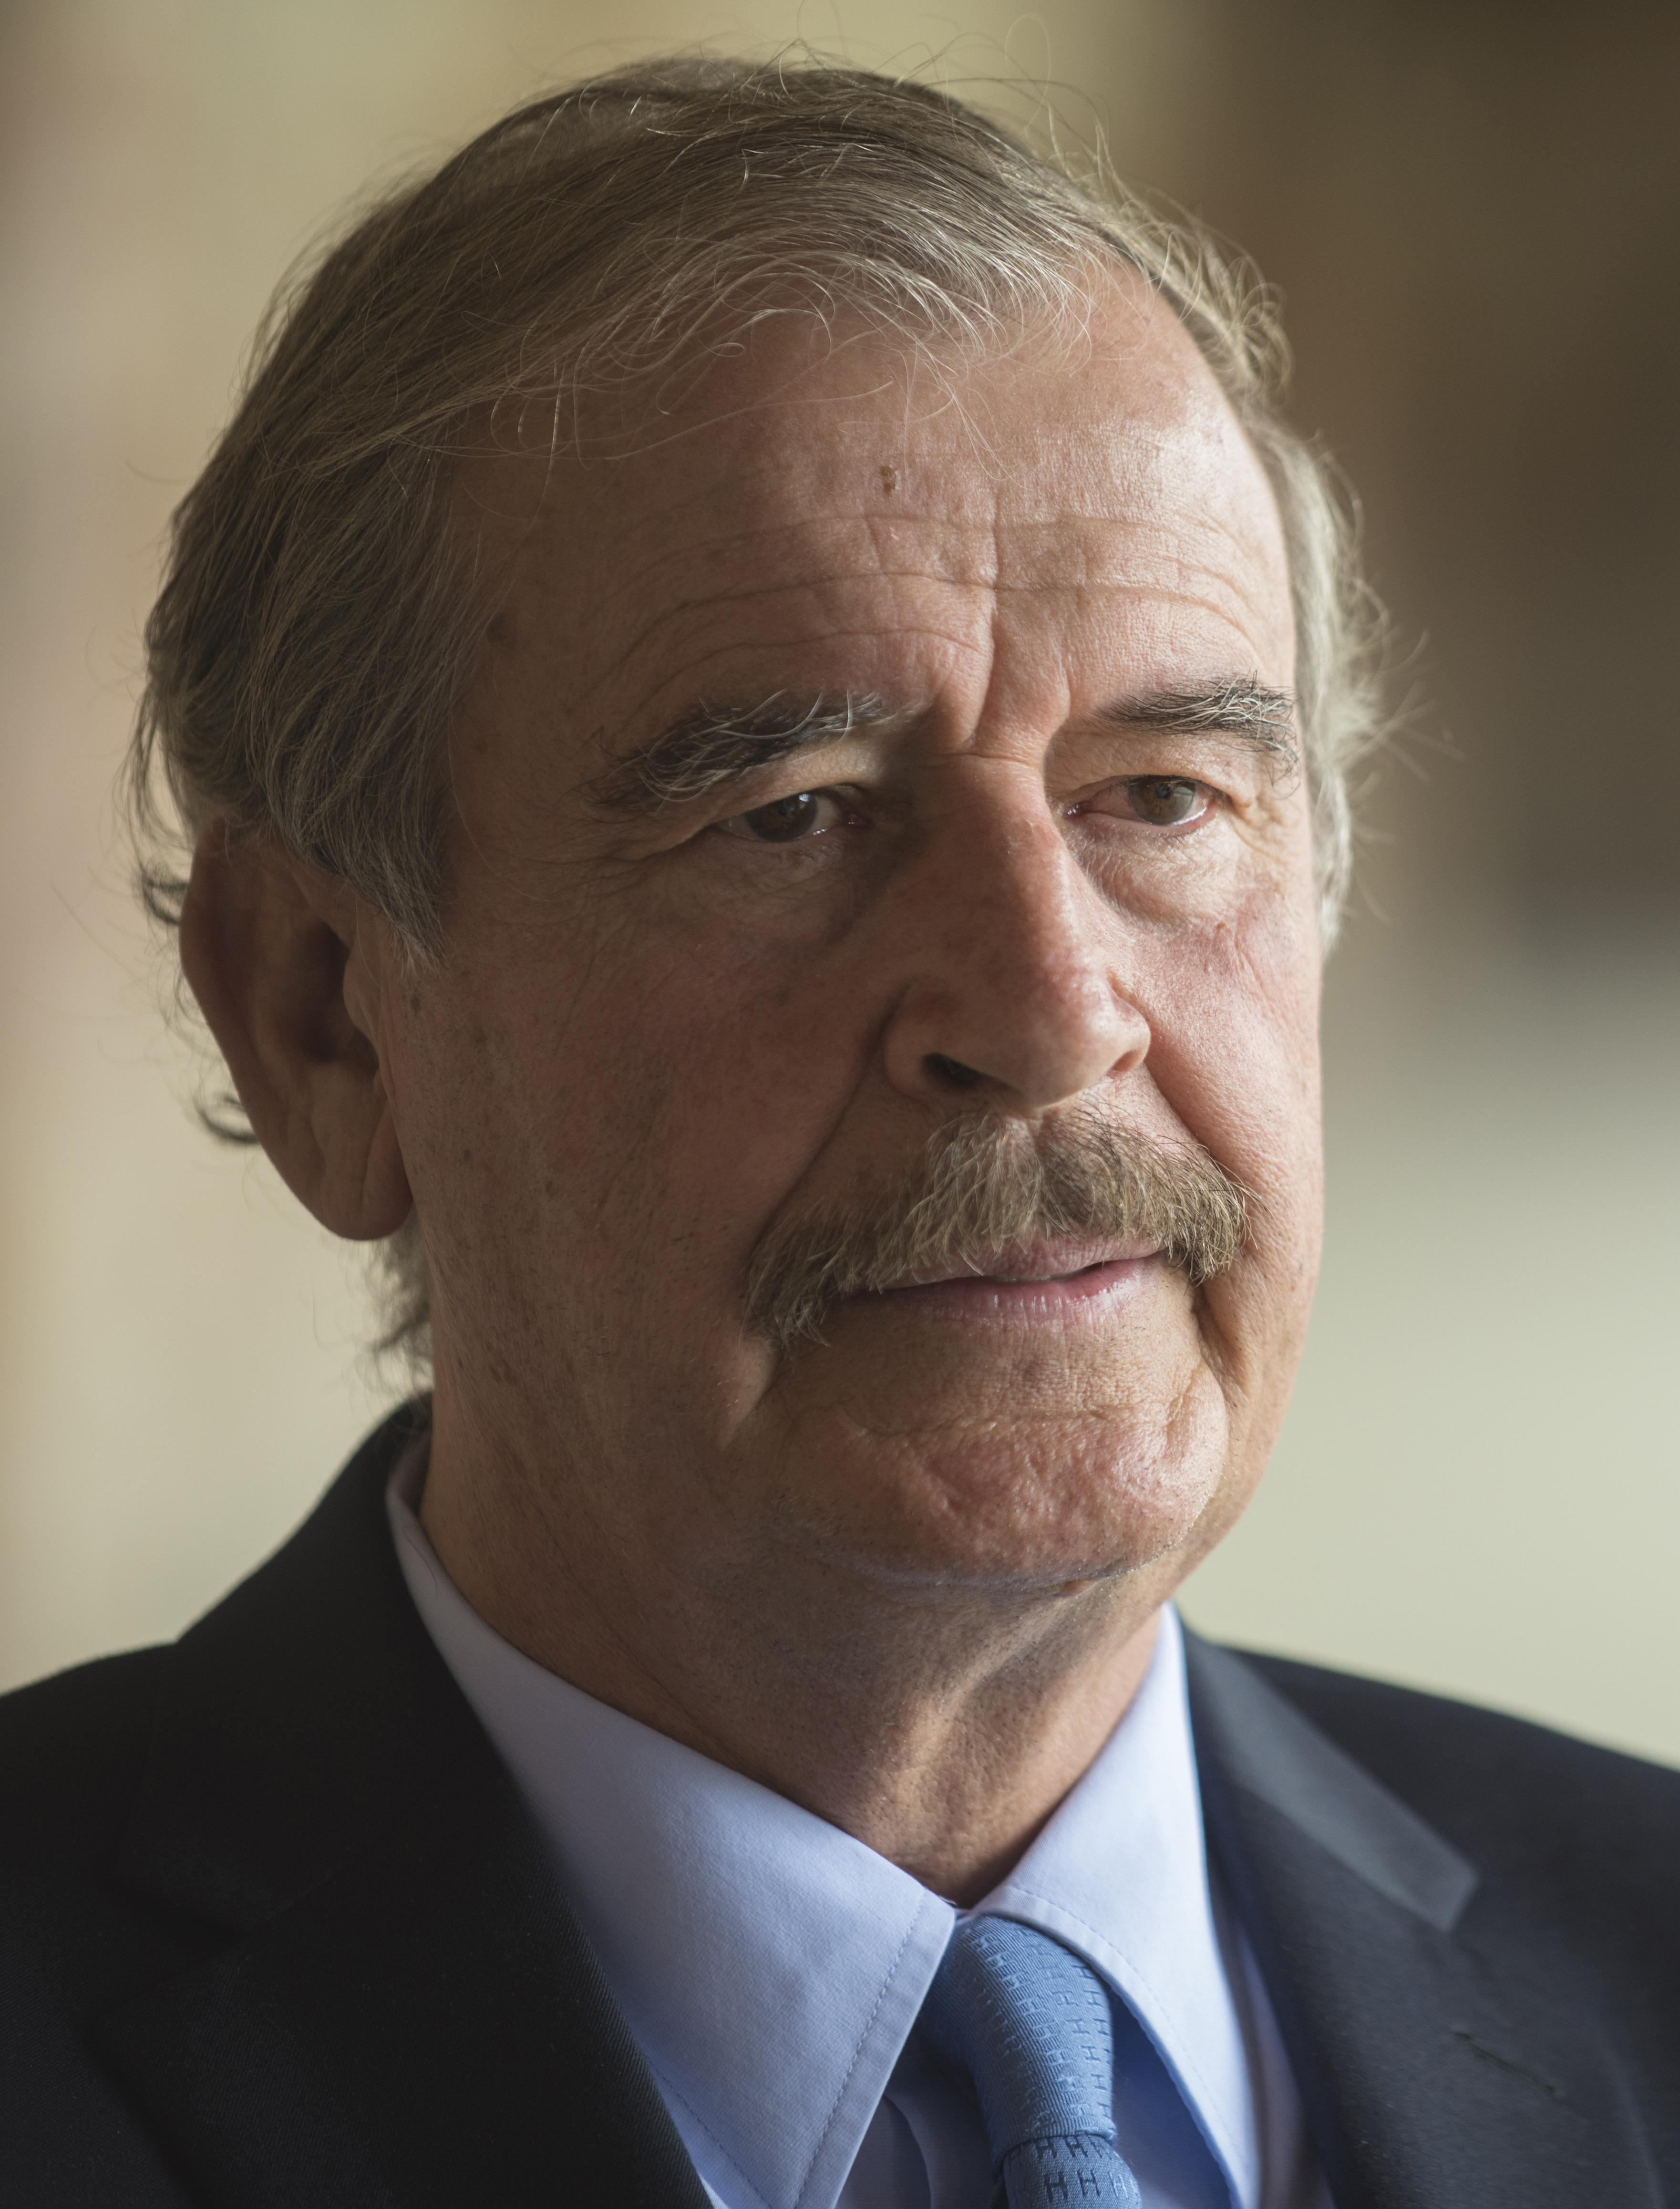 Poet Vicente Fox